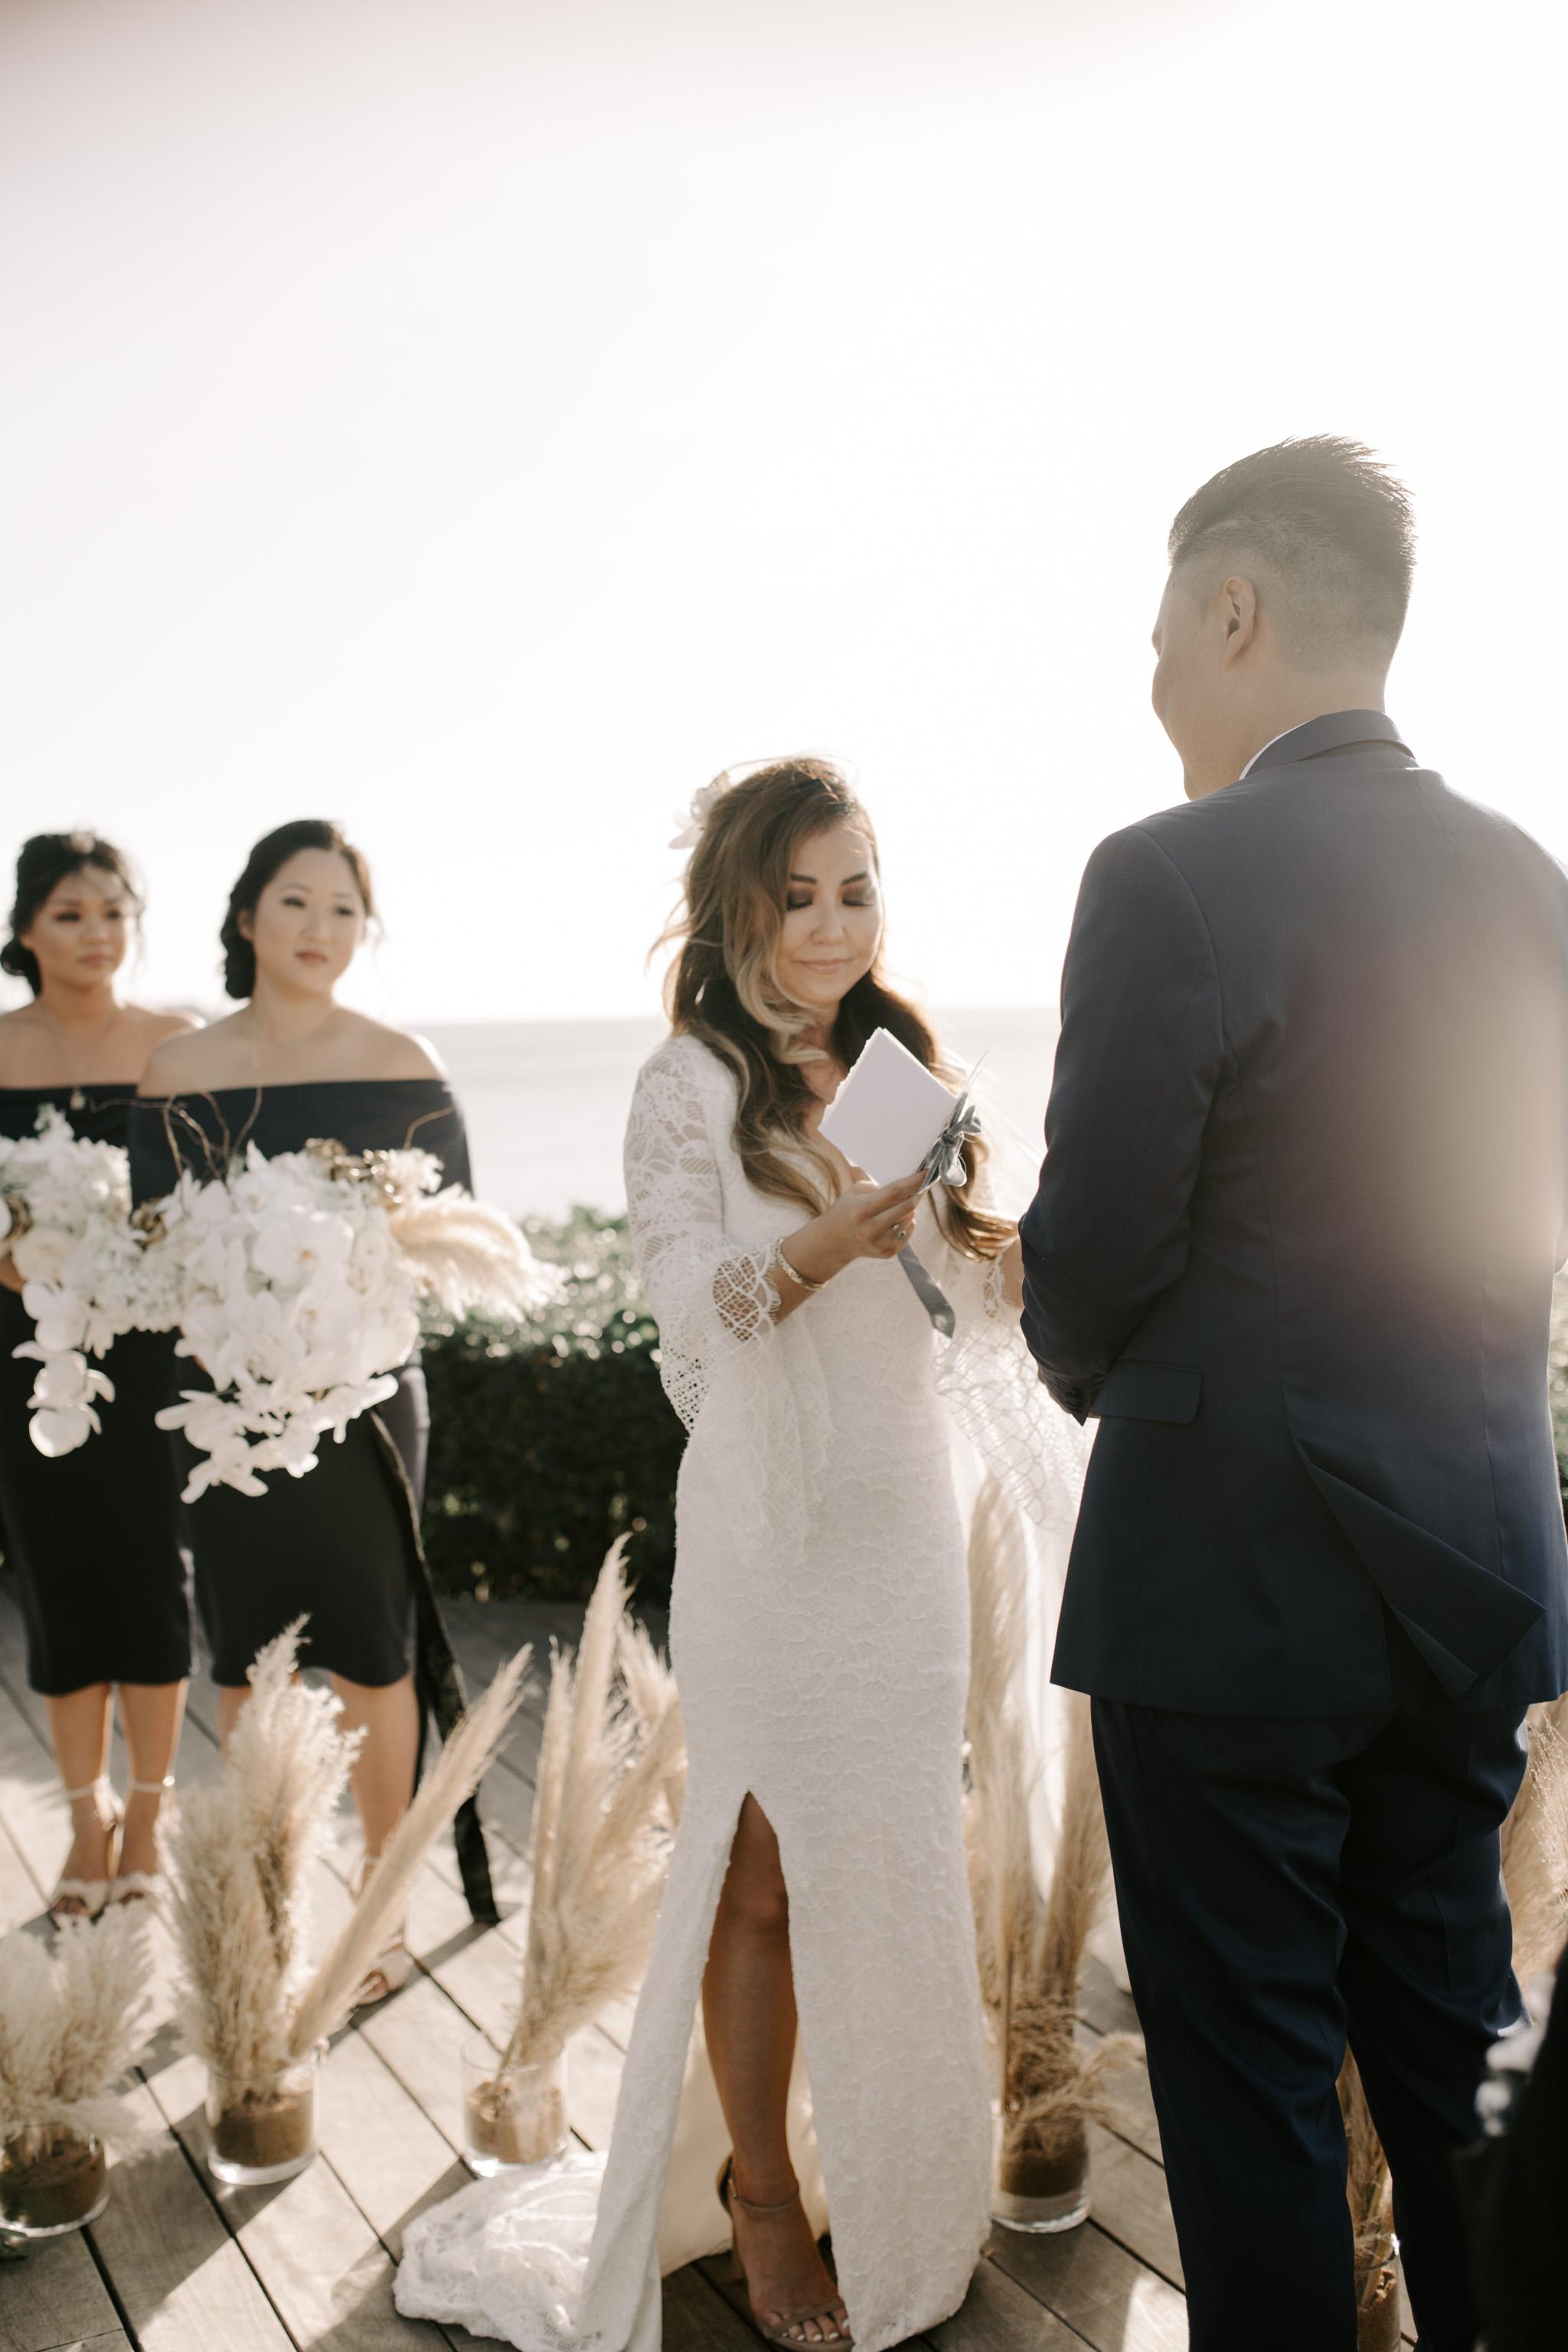 Bride reading her vows   Merriman's Kapalua Maui wedding by Hawaii wedding photographer Desiree Leilani